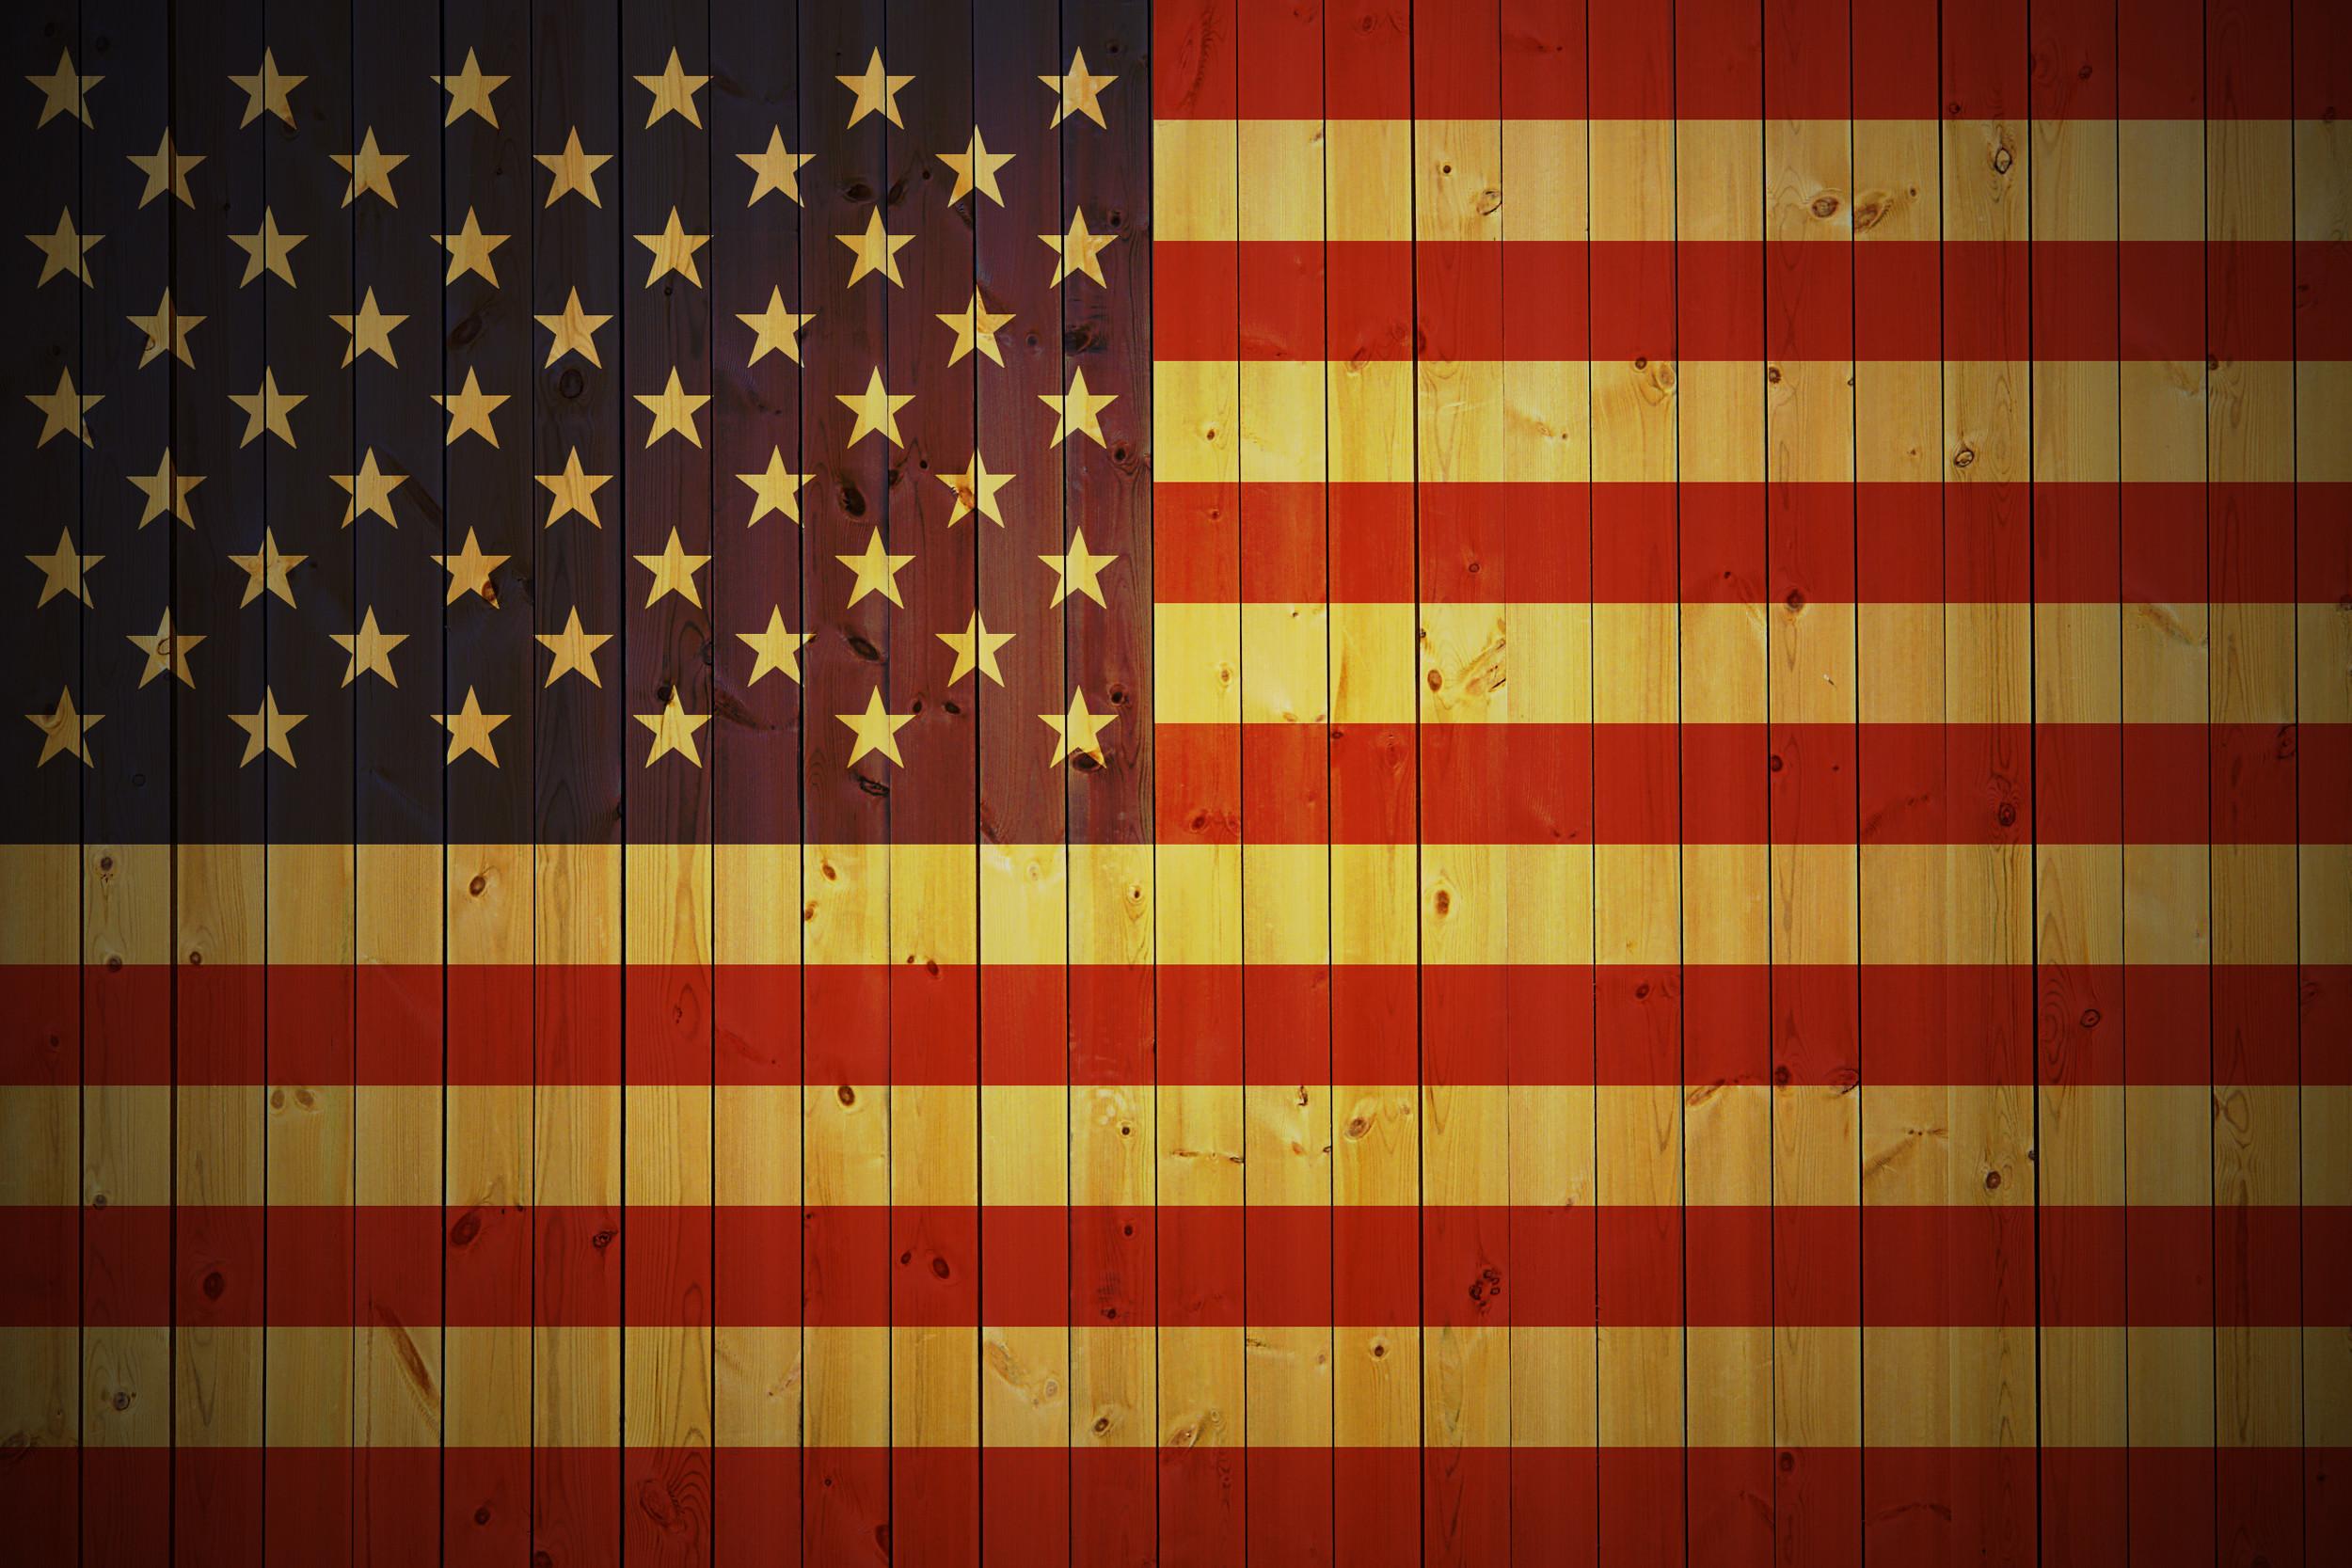 american flag screensavers and wallpaper 73 images